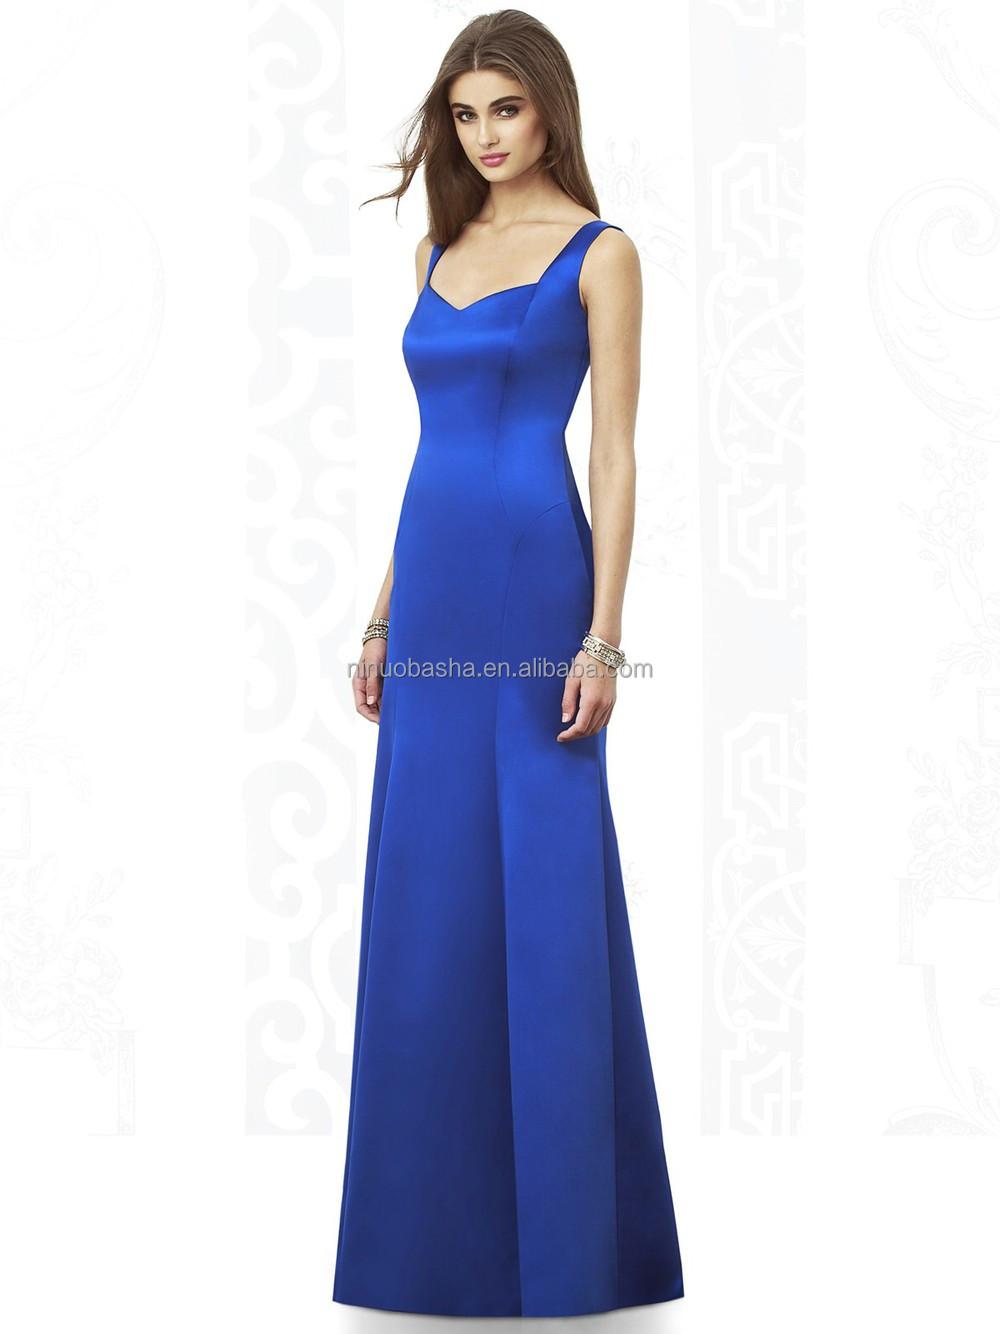 2015 full length long bridesmaid dress patterns in blue color 2015 full length long bridesmaid dress patterns in blue color sweetheart sleeveless zipper satin mermaid ombrellifo Images